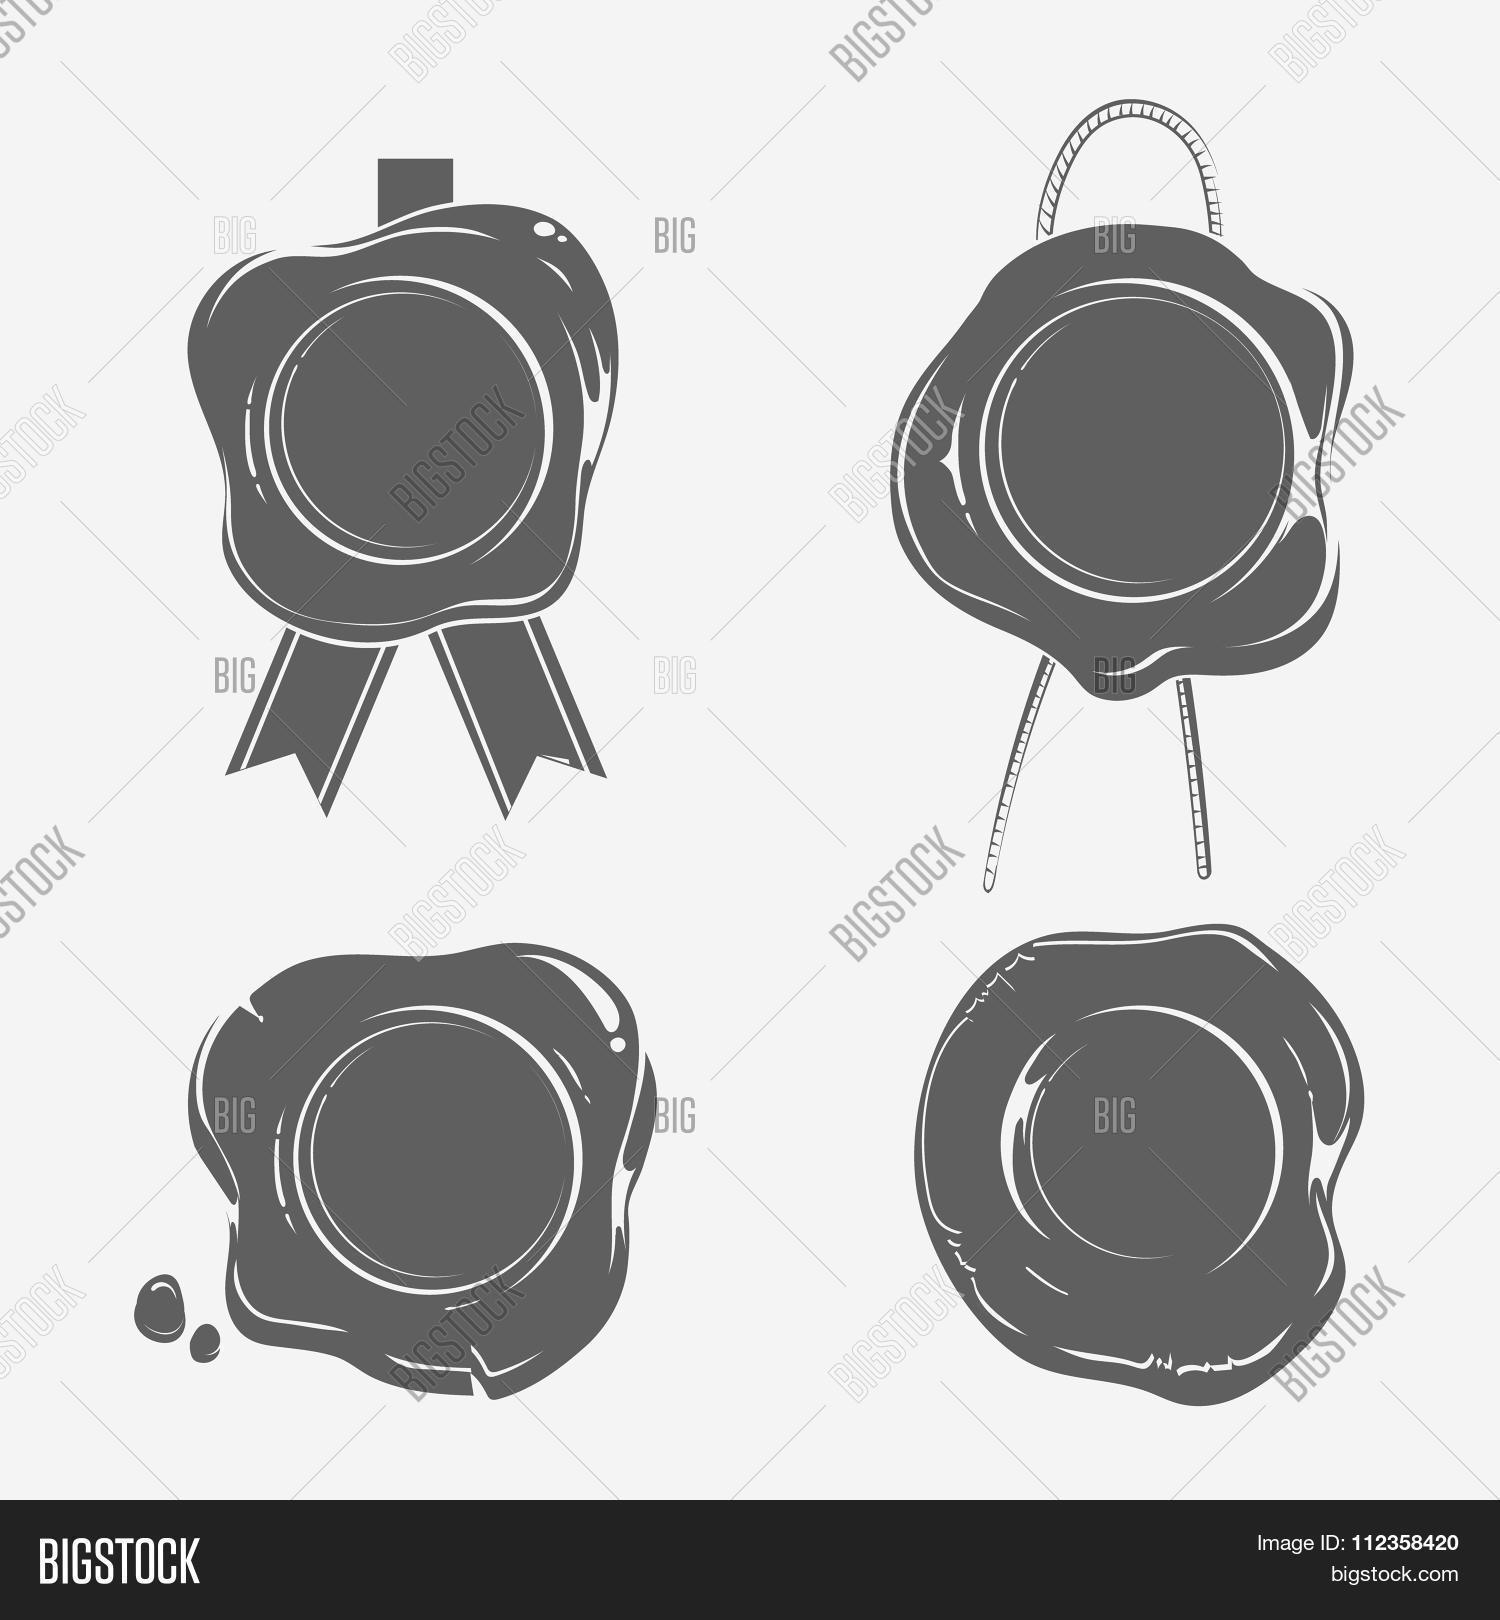 Wax Seals Black Vector & Photo (Free Trial) | Bigstock